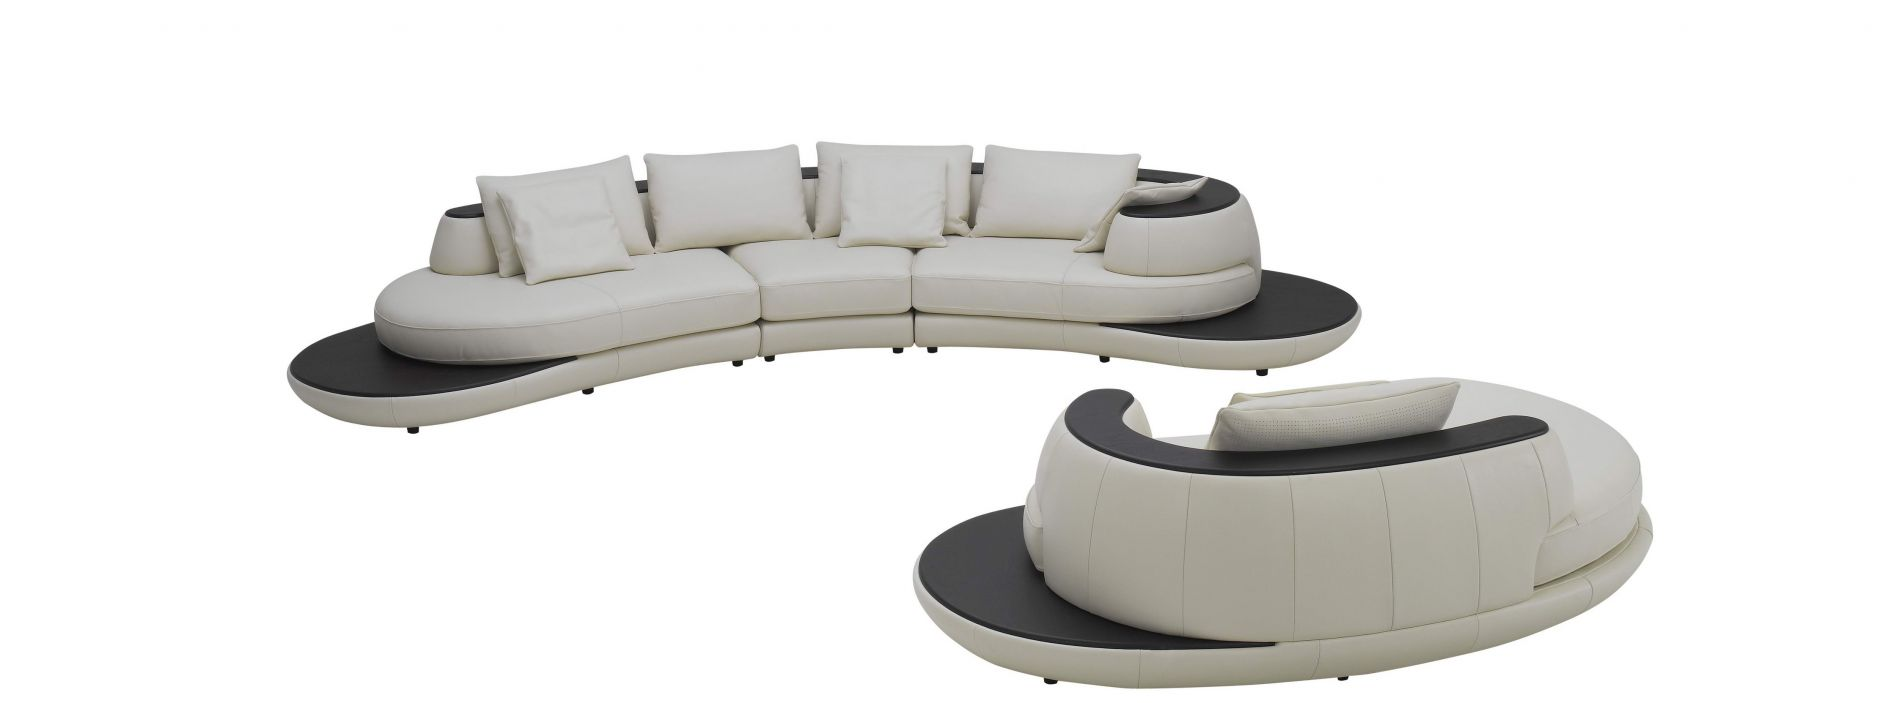 schnittsofa schnittsofa 109die m bel aus italien. Black Bedroom Furniture Sets. Home Design Ideas